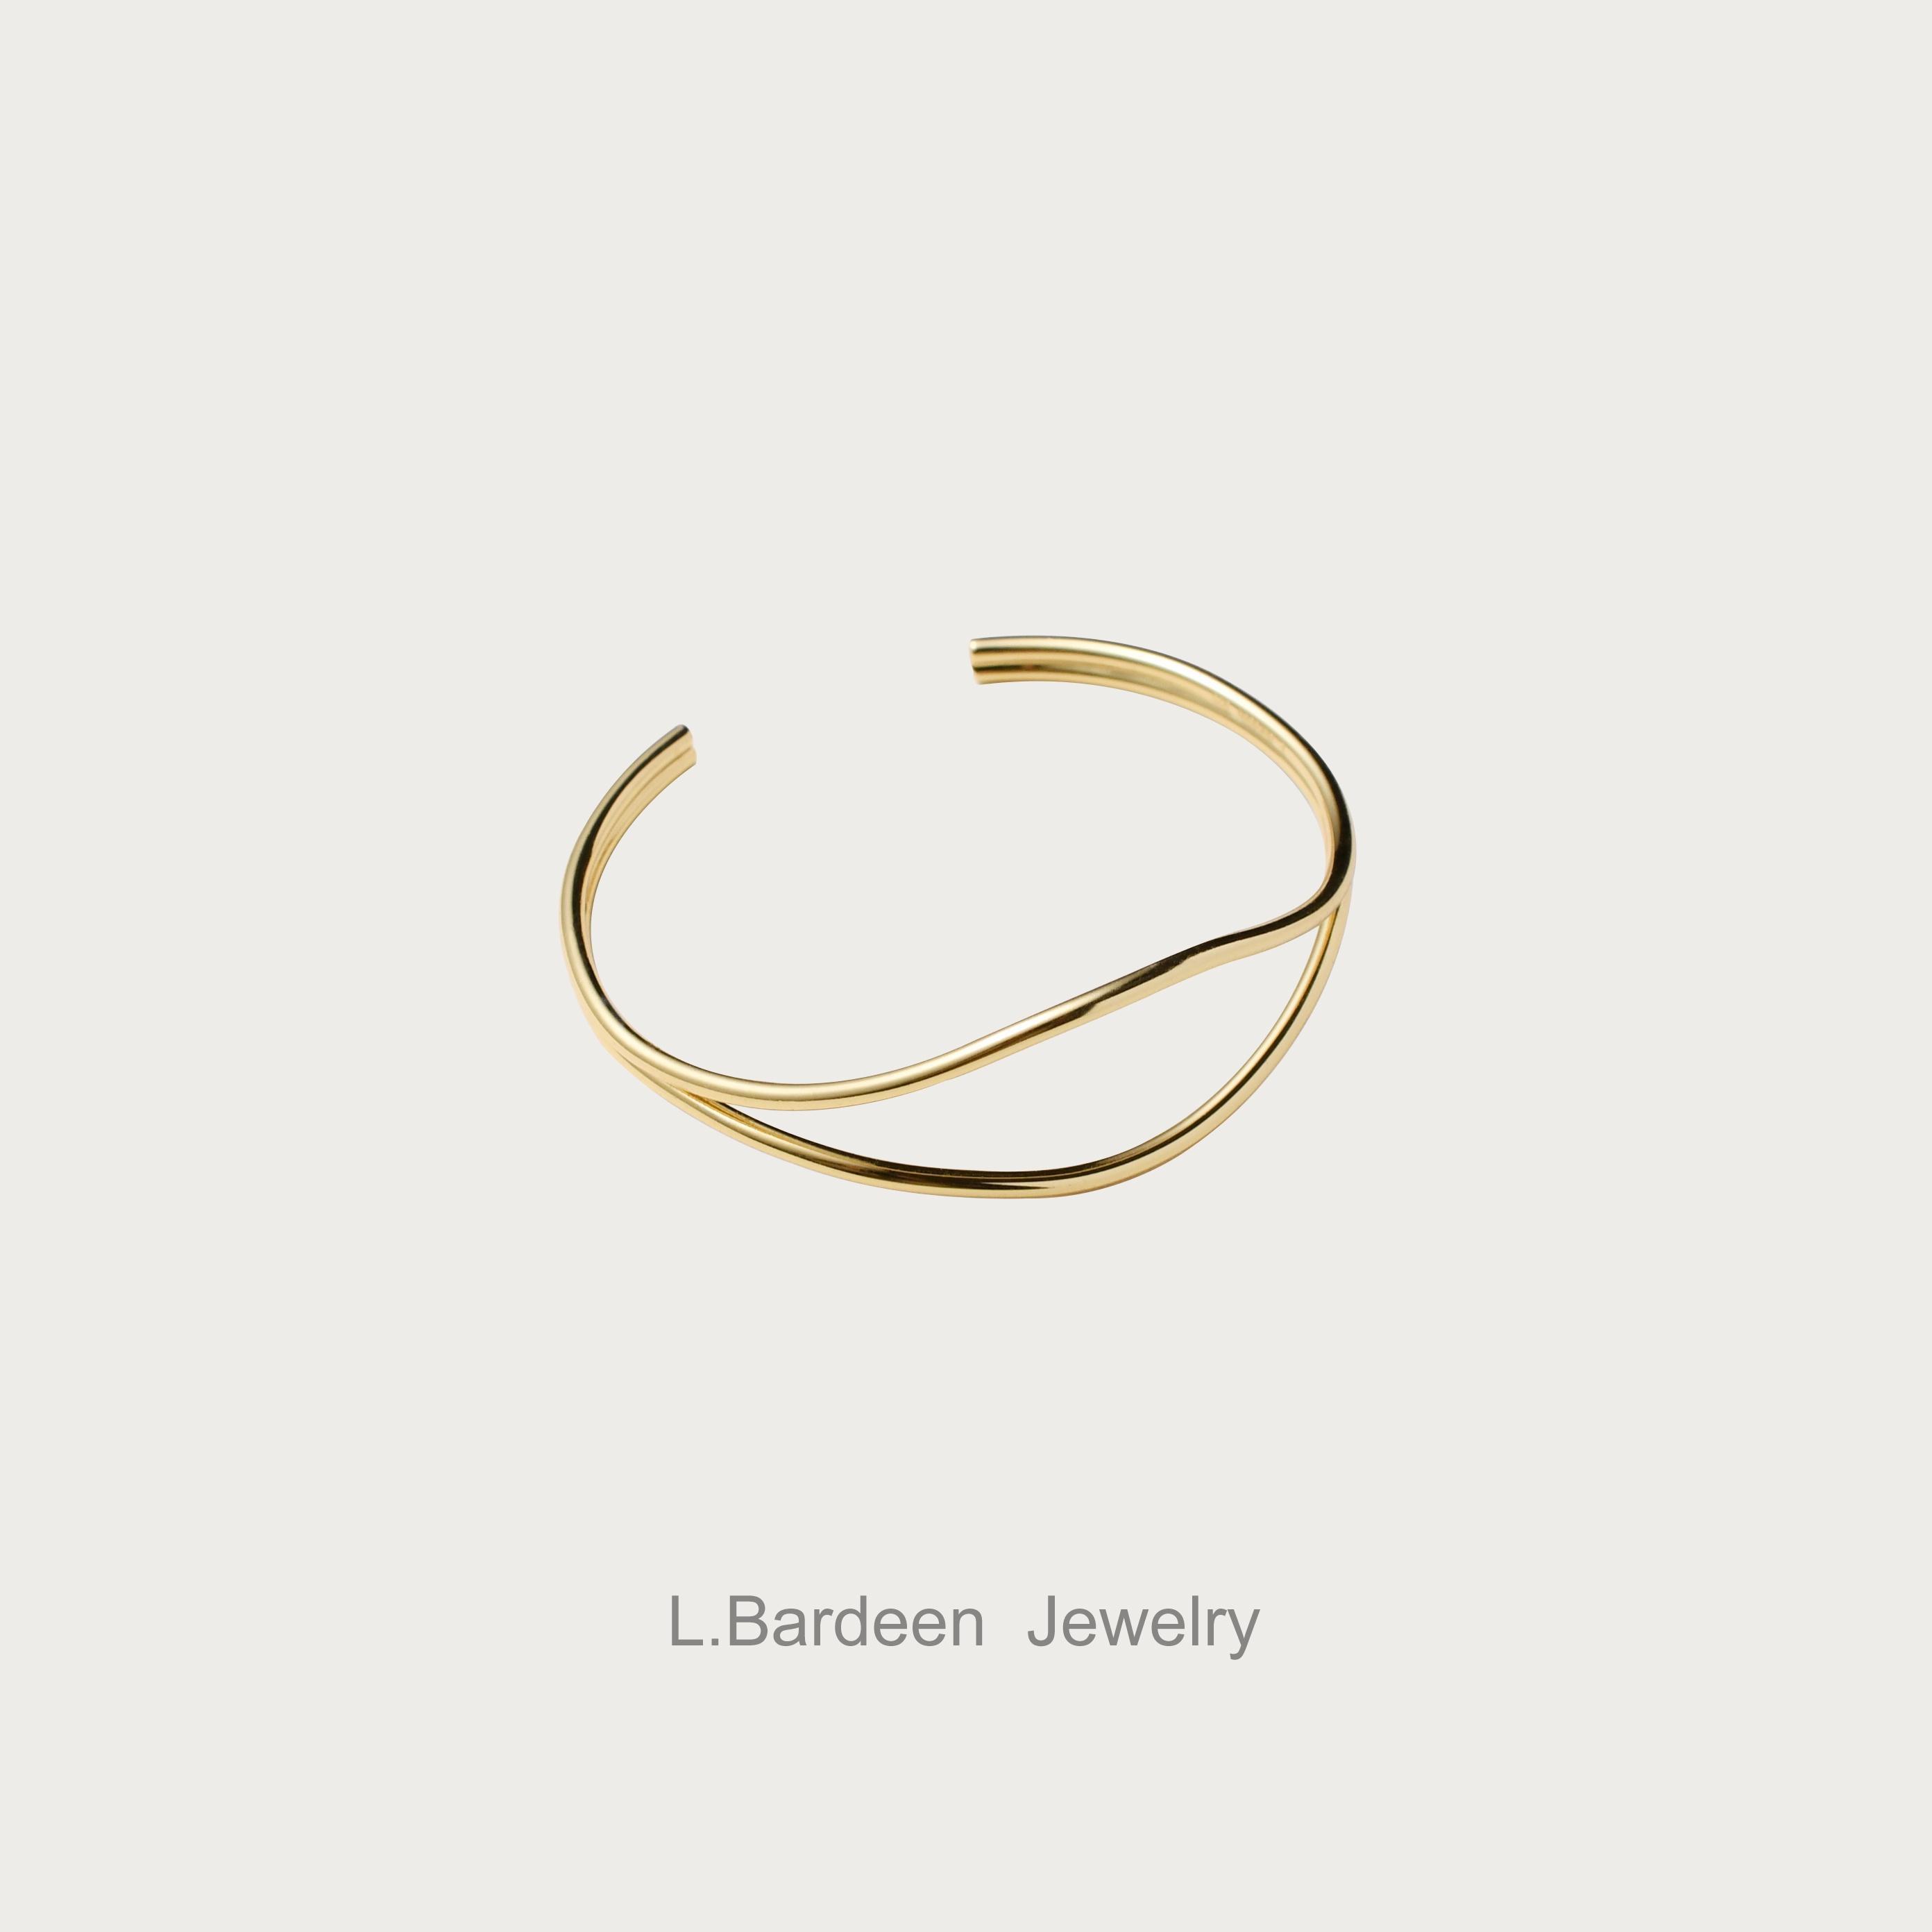 Authentic L. Bardeen Sterling Silver Bracelet simple Bracelet Gold temperament retro geometry original niche design